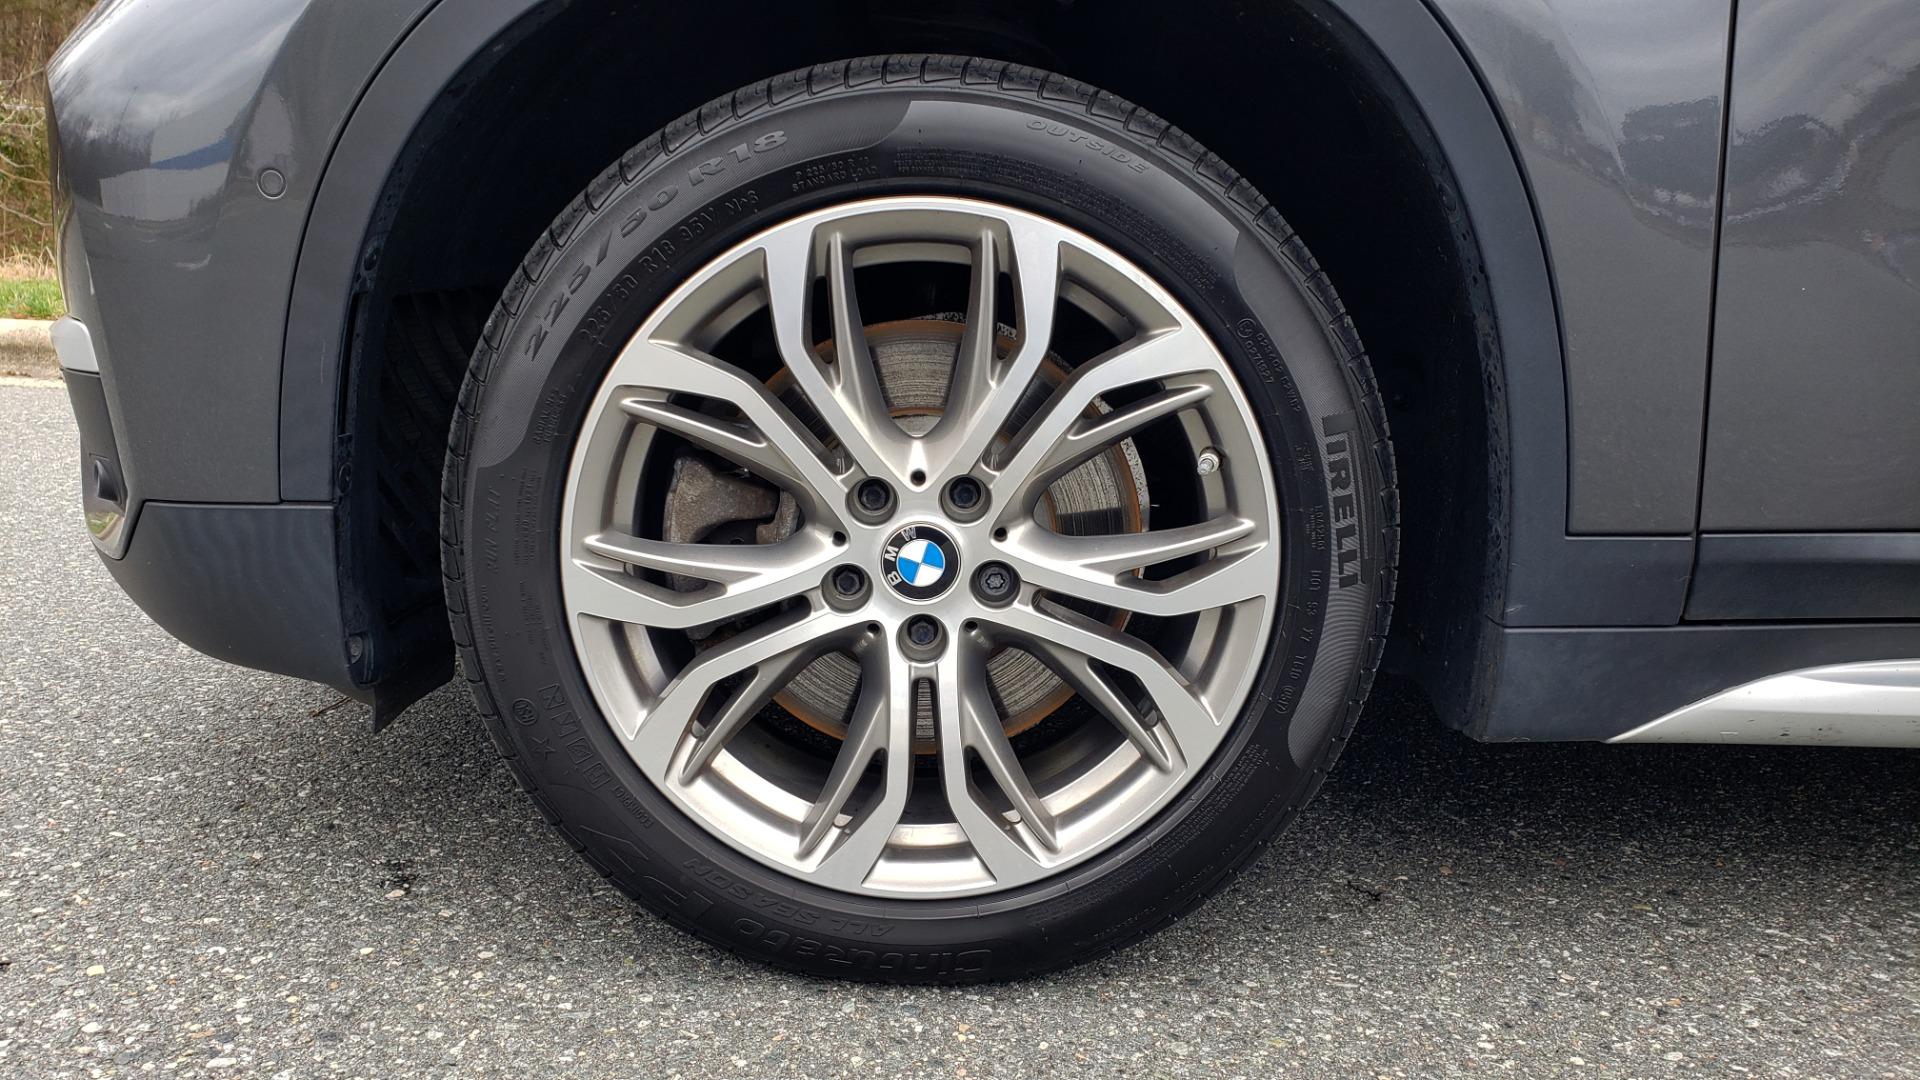 Used 2017 BMW X1 XDRIVE28I / PREM PKG / DRIVER ASST / NAV / CLD WTHR for sale Sold at Formula Imports in Charlotte NC 28227 83